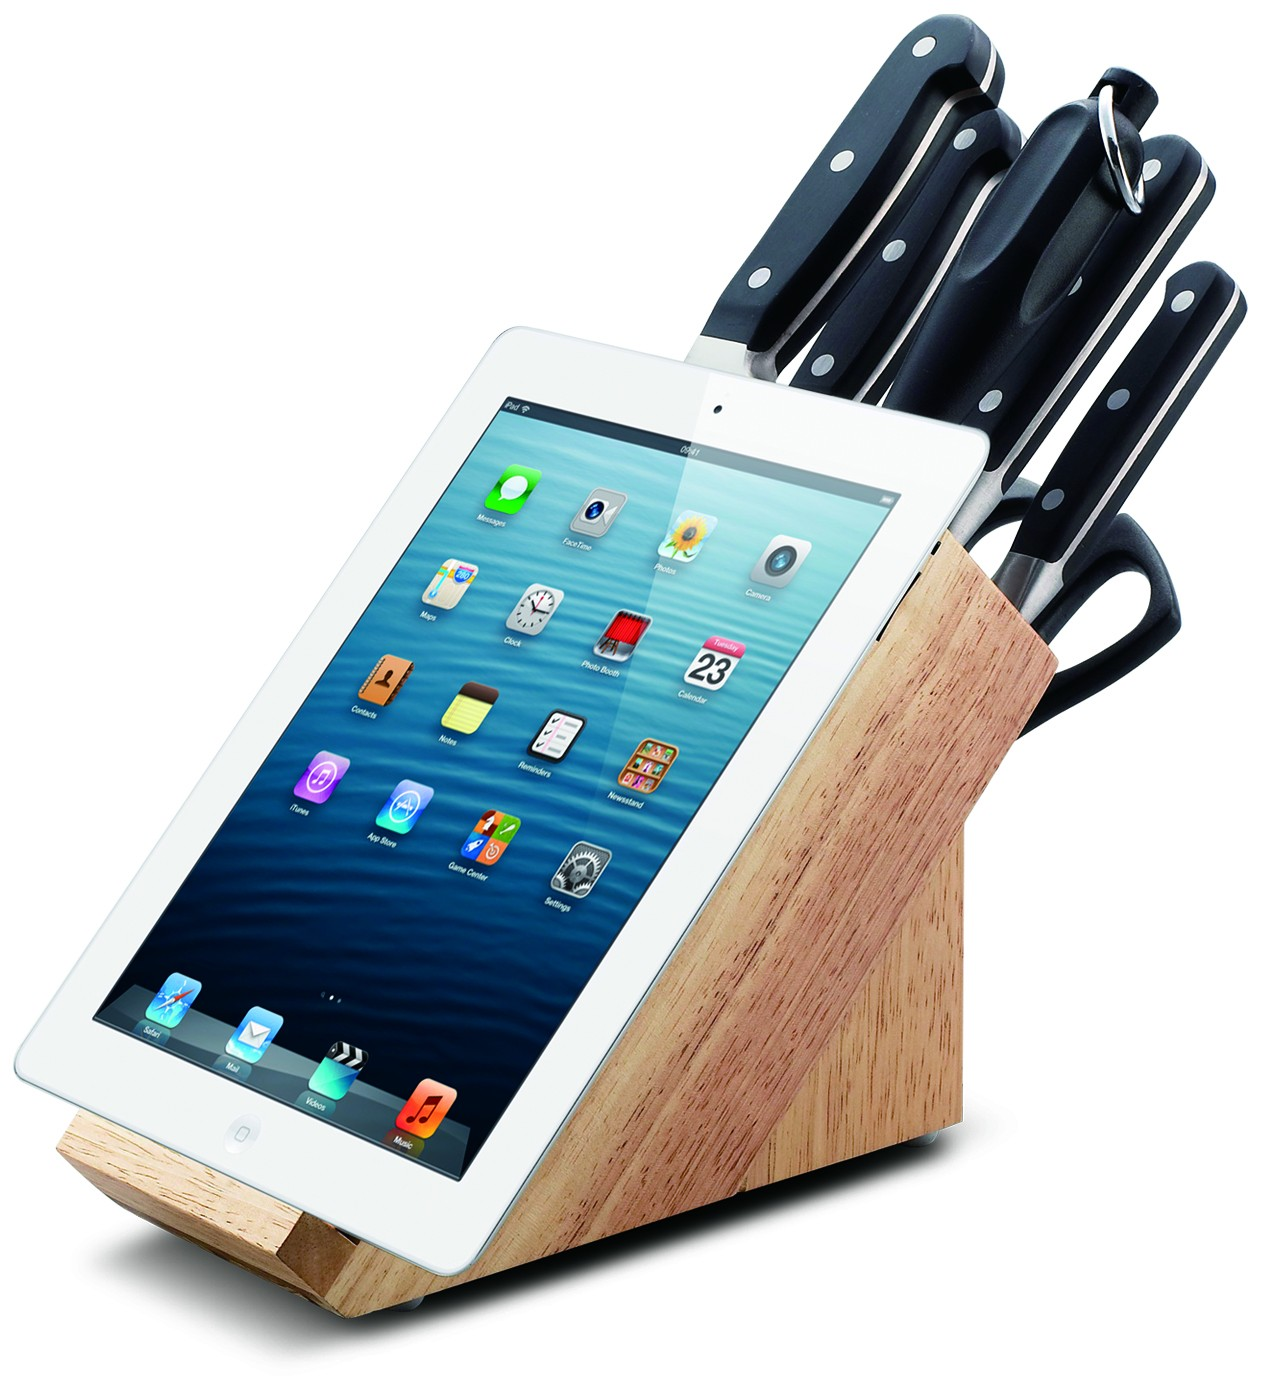 PREMIUM Messerblock - Messerblock mit Tablet-Halter